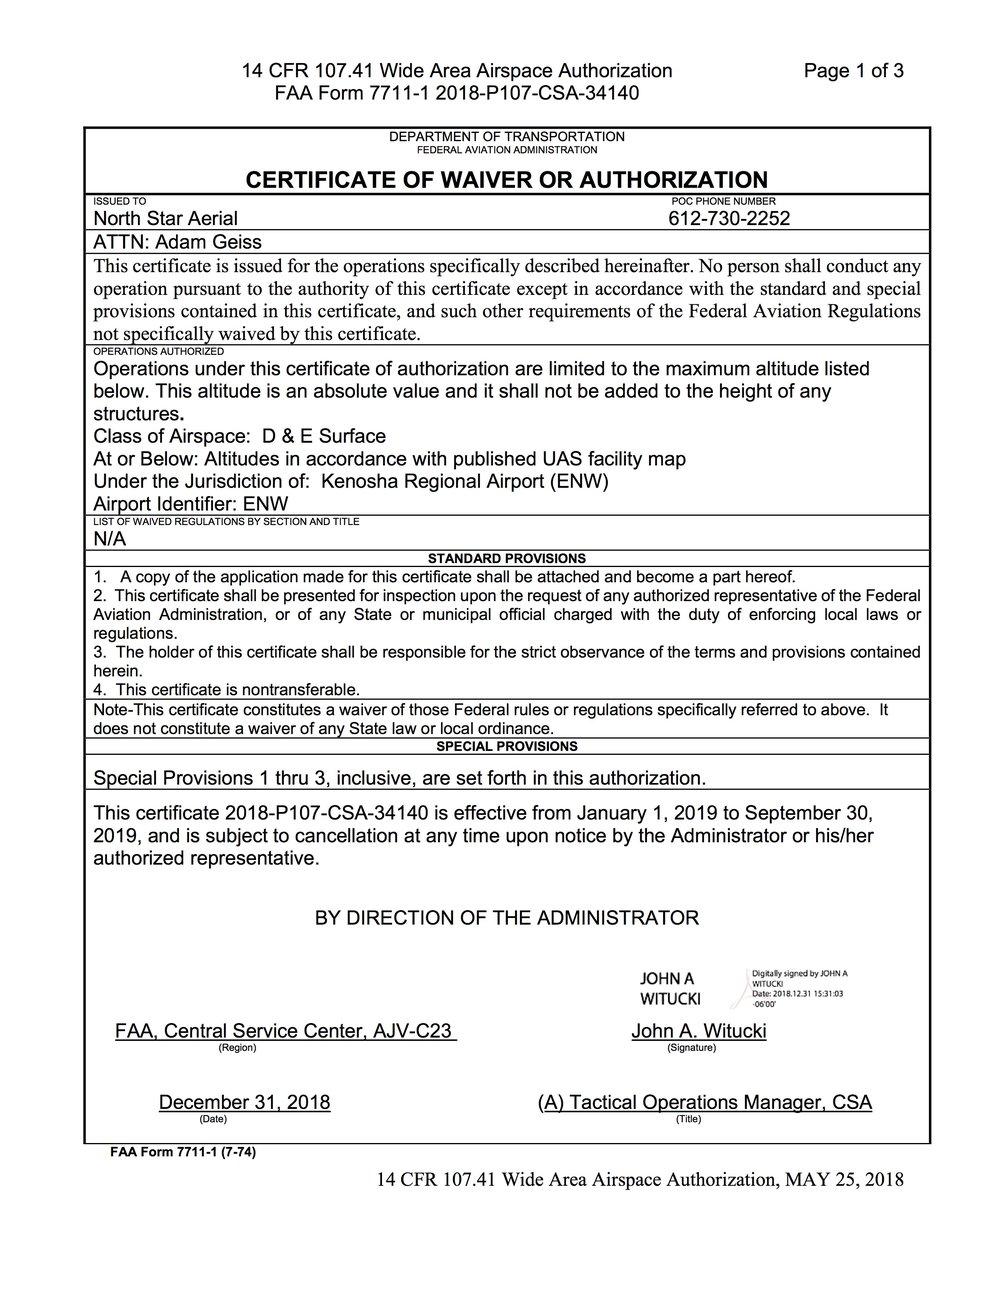 FAA Form 7711-1 2018-P107-CSA-34140 ENW.jpg